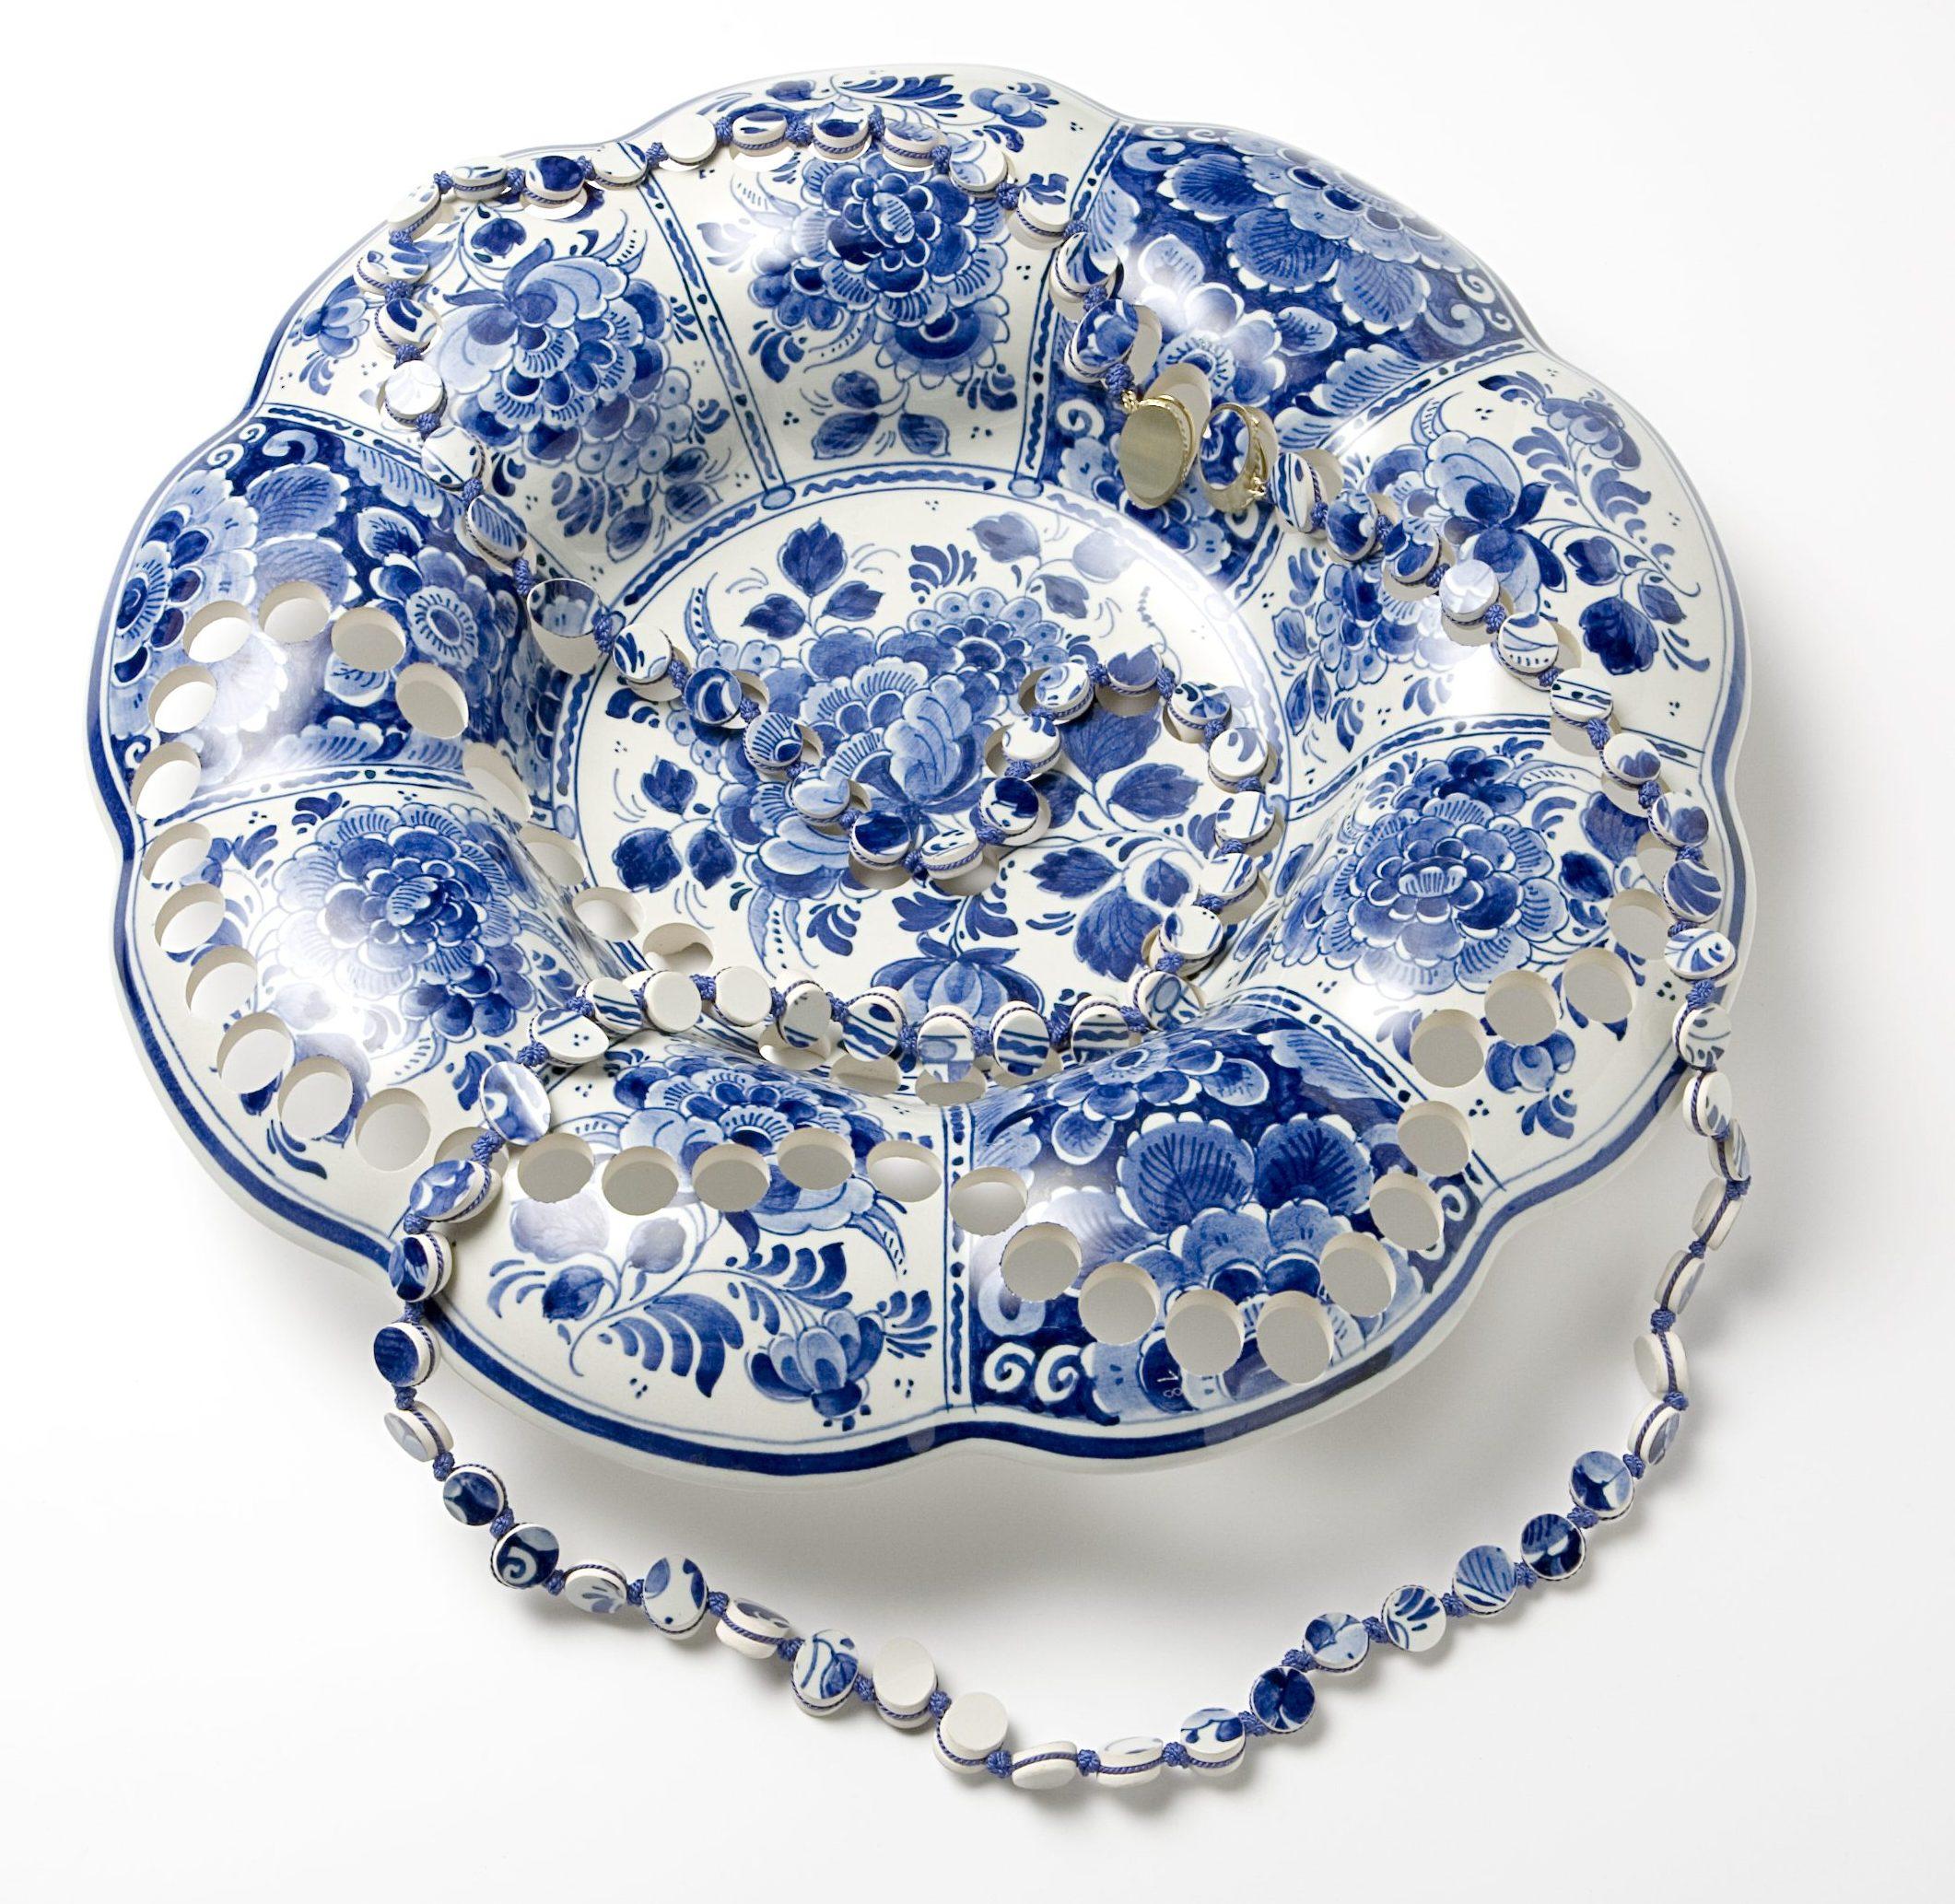 Gésine Hackenberg, halssieraad, 2006. Collectie CODA, keramiek, textiel